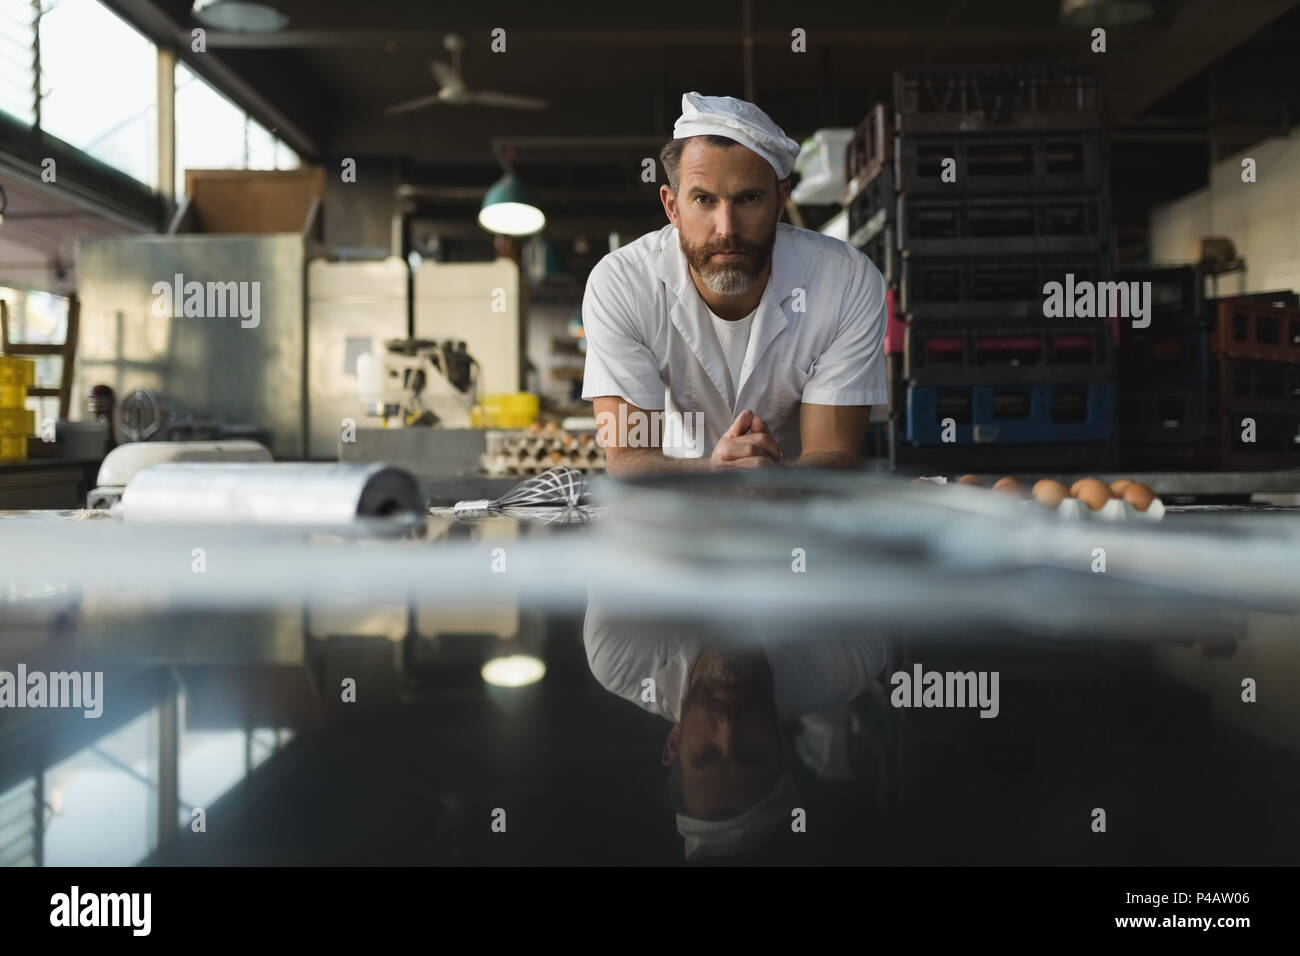 Male baker standing in bakery shop - Stock Image